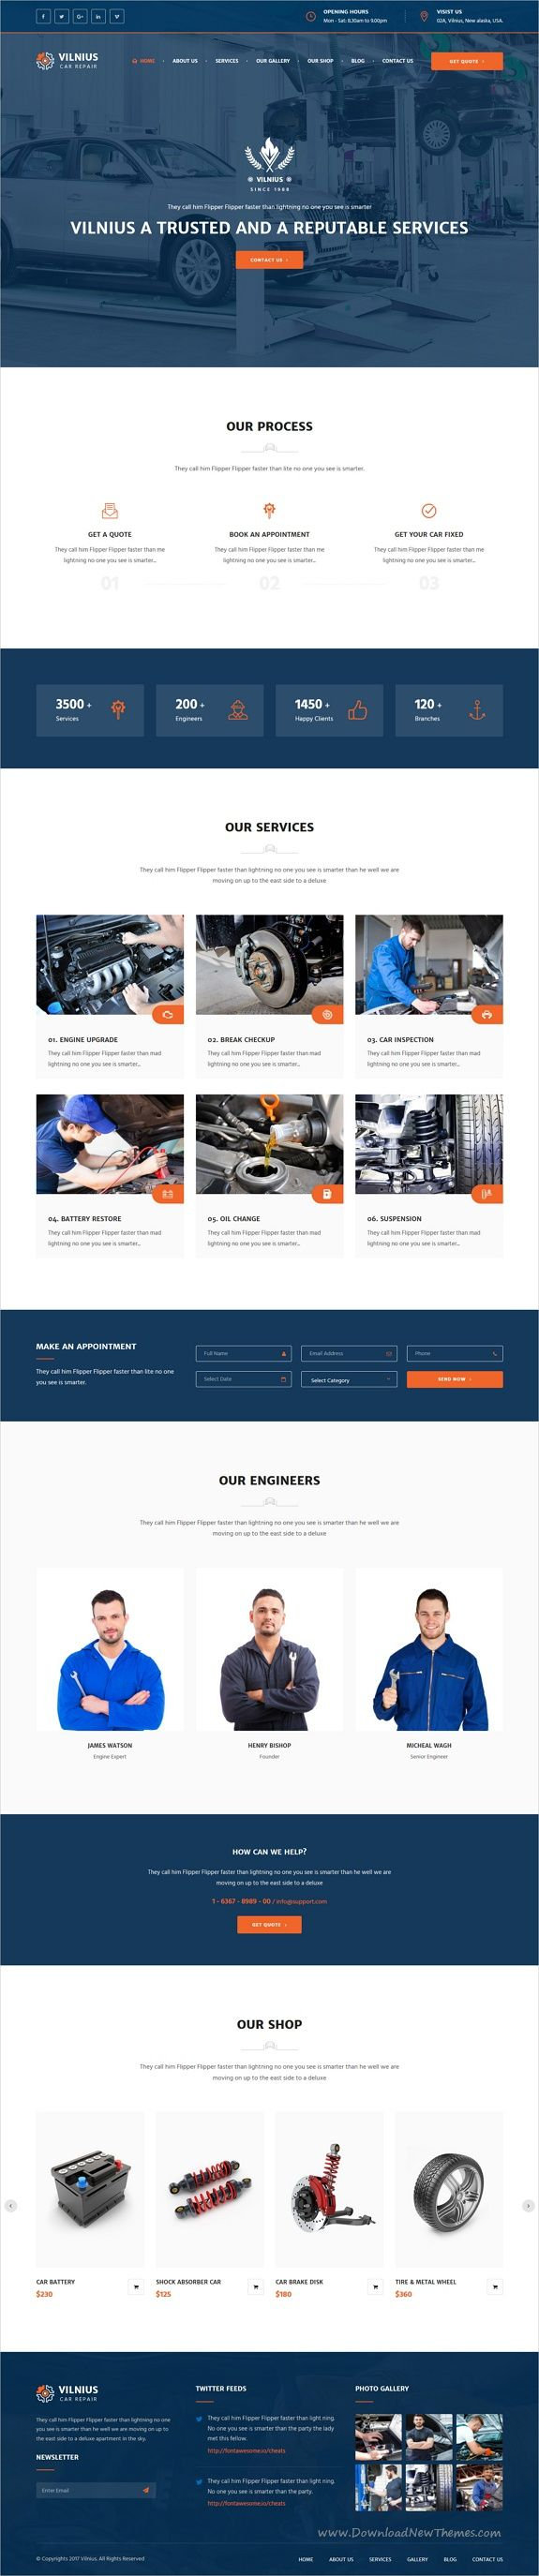 Best 25 car repair shops ideas on pinterest auto repair near me vilnius auto mechanic car repair template solutioingenieria Image collections